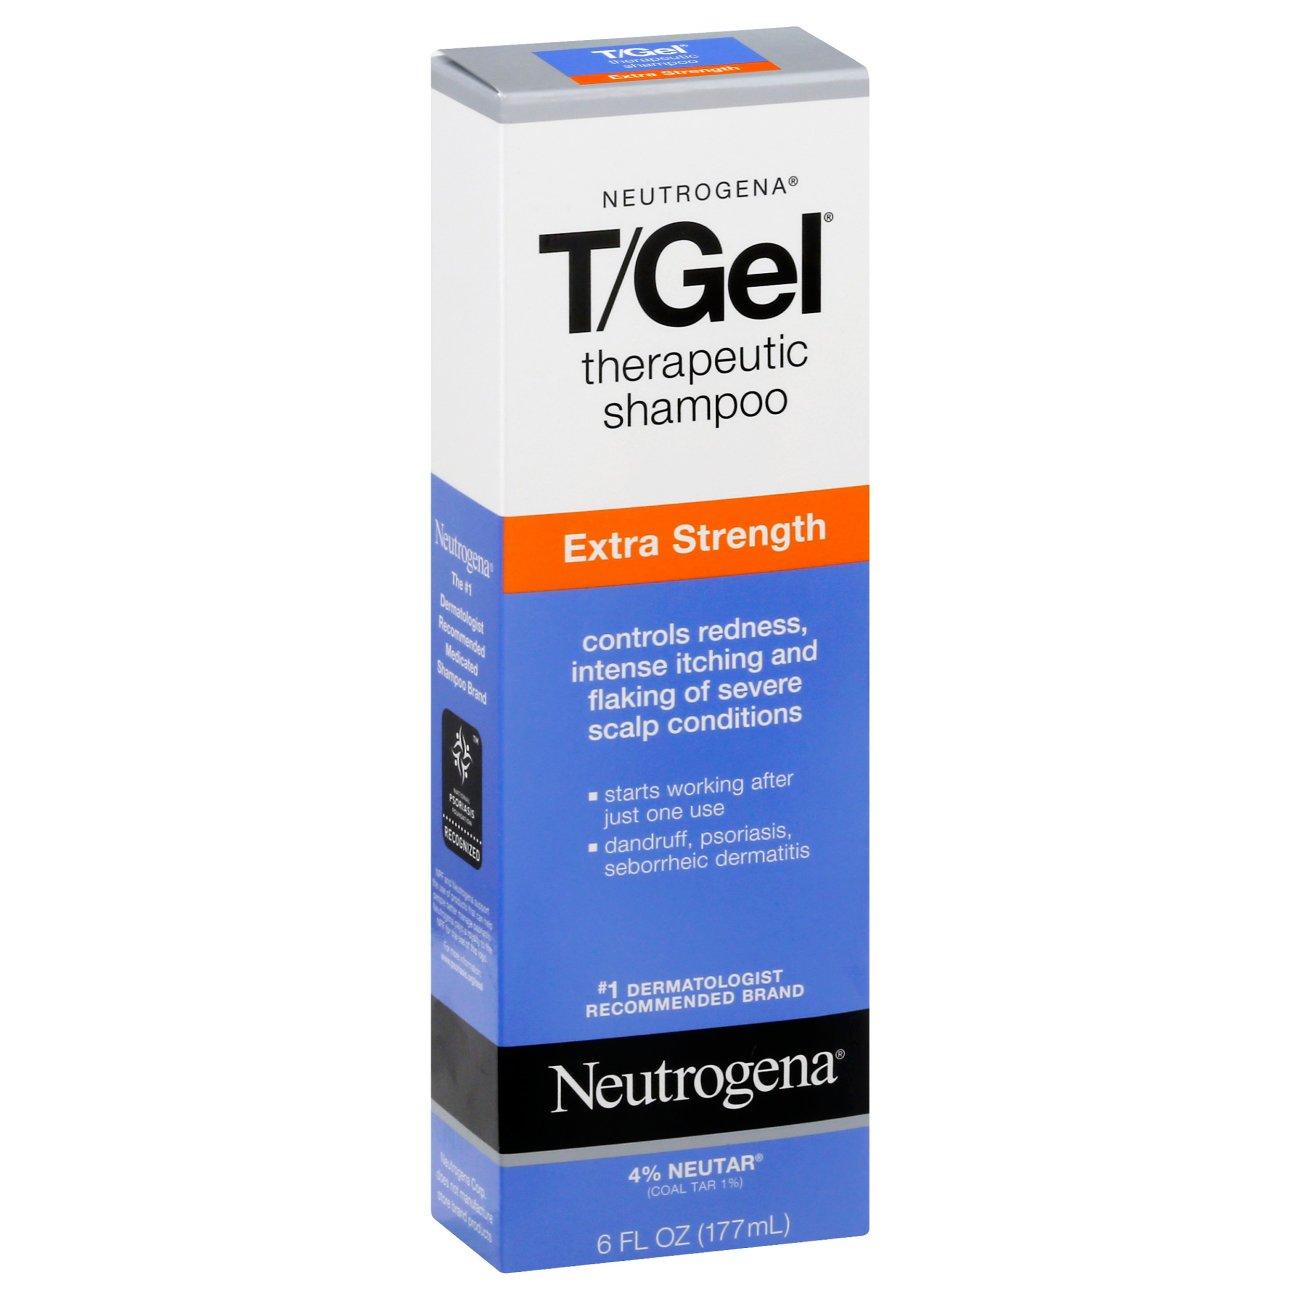 neutrogena t gel therapeutic extra strength shampoo shop neutrogena t gel therapeutic extra strength shampoo shop therapeutic shampoo at heb